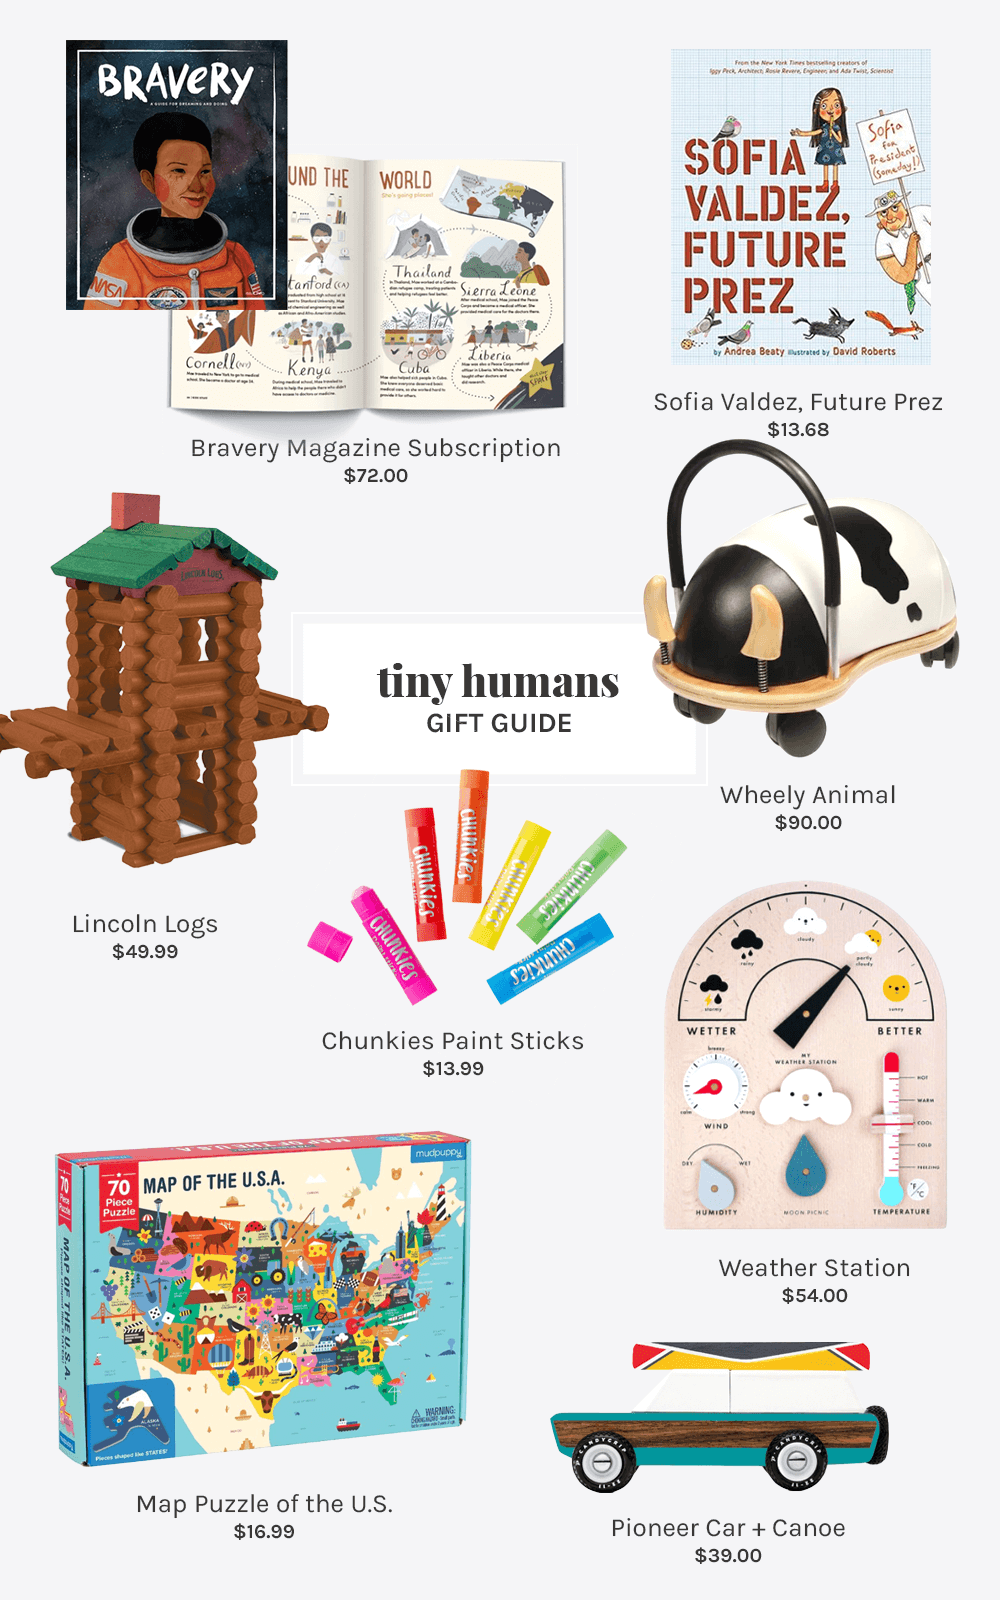 2019 Gift Guide for kids